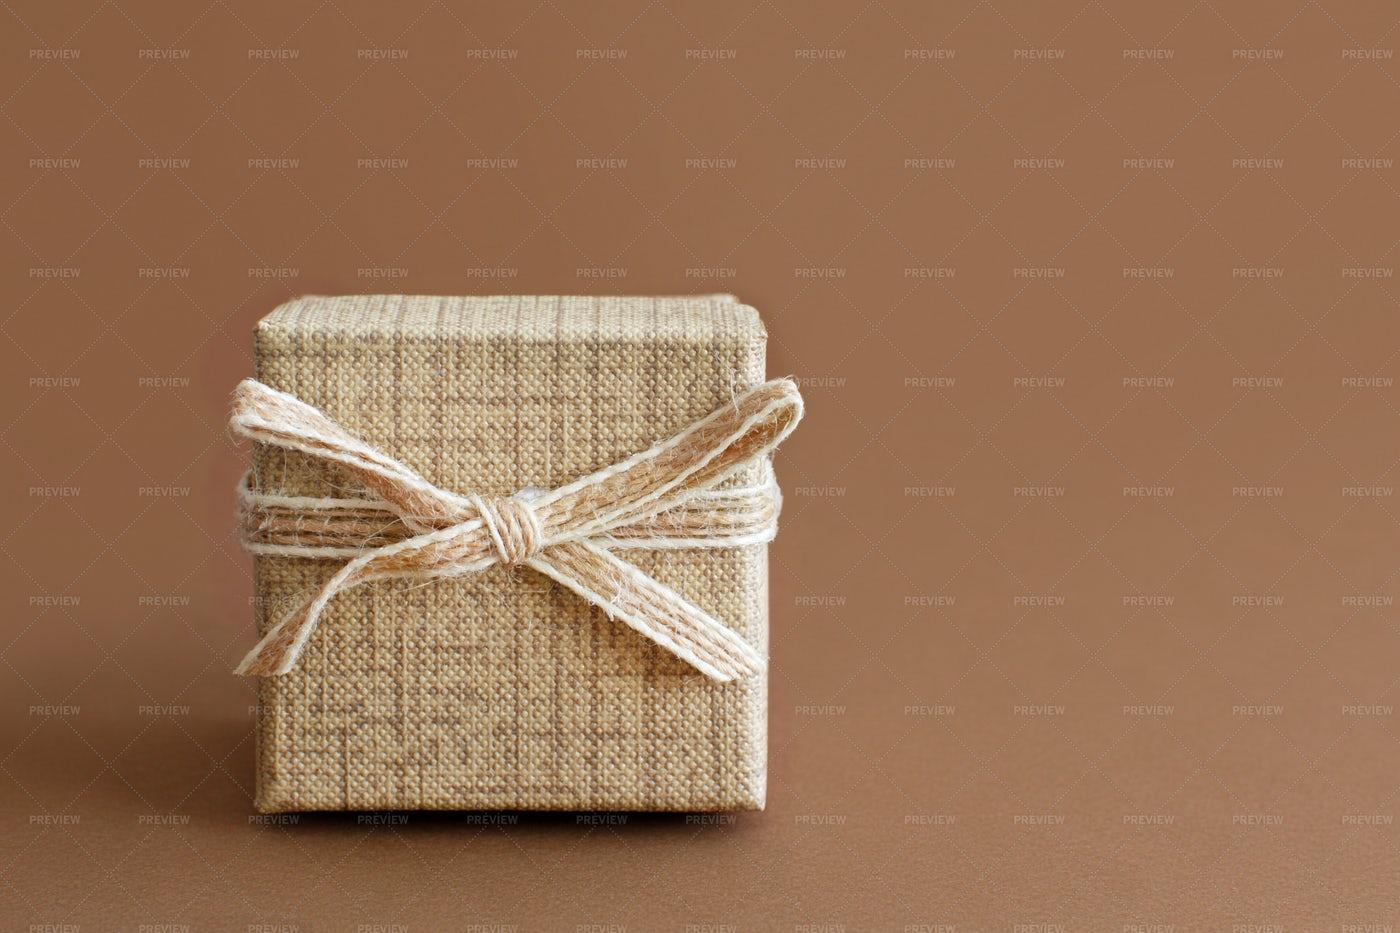 Cream Gift Box On Brown: Stock Photos